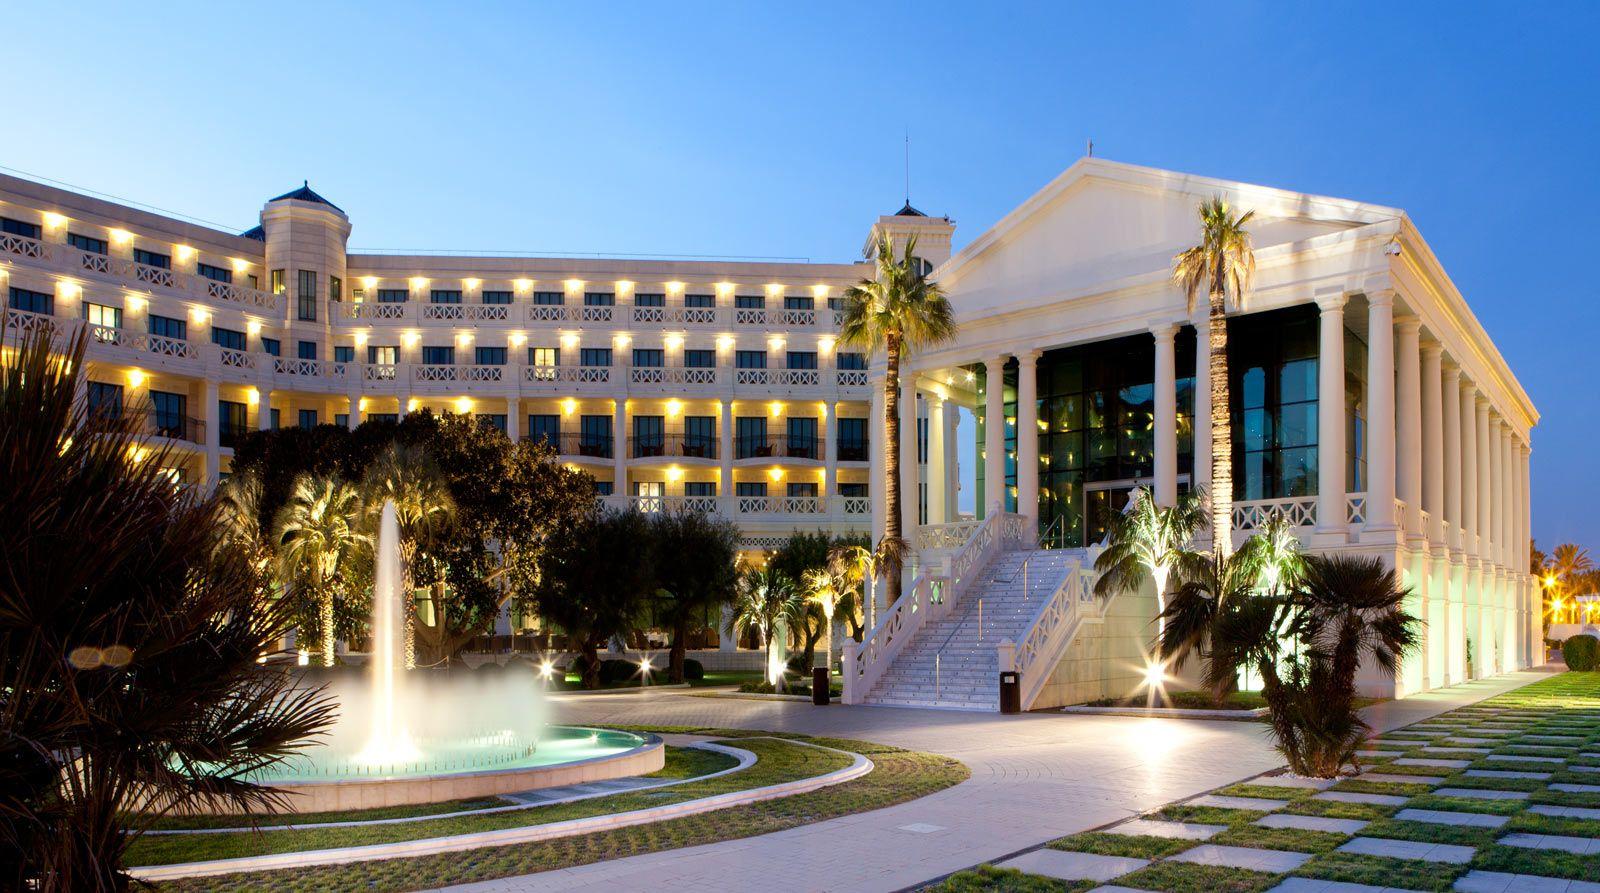 Hotel Valencia Las Arenas Perfect Beachfront Location